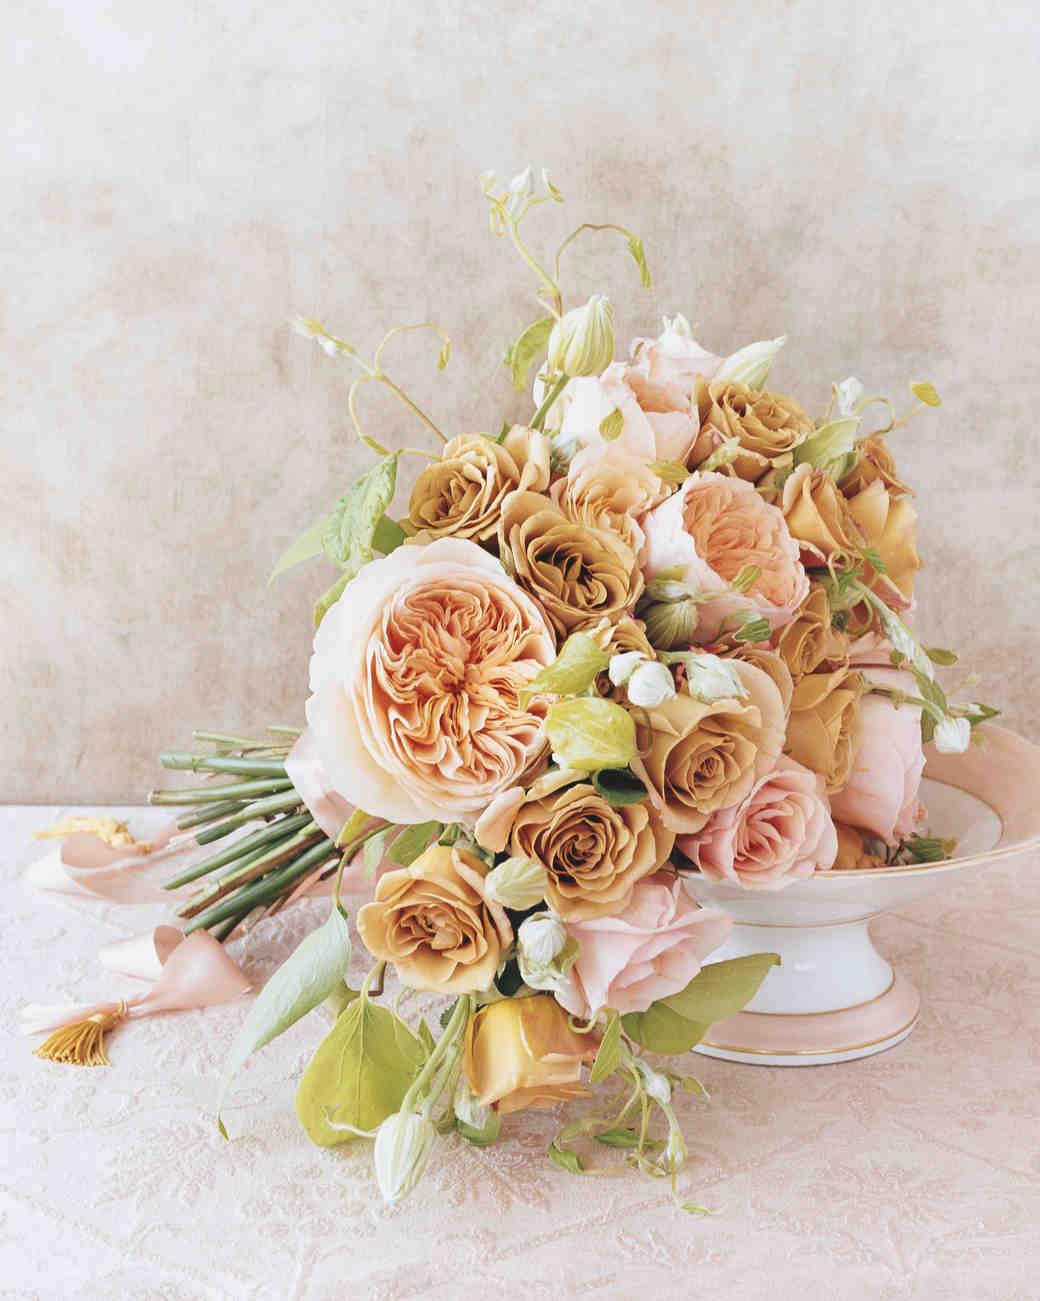 pink-bouquets-mwa10257602-0115.jpg